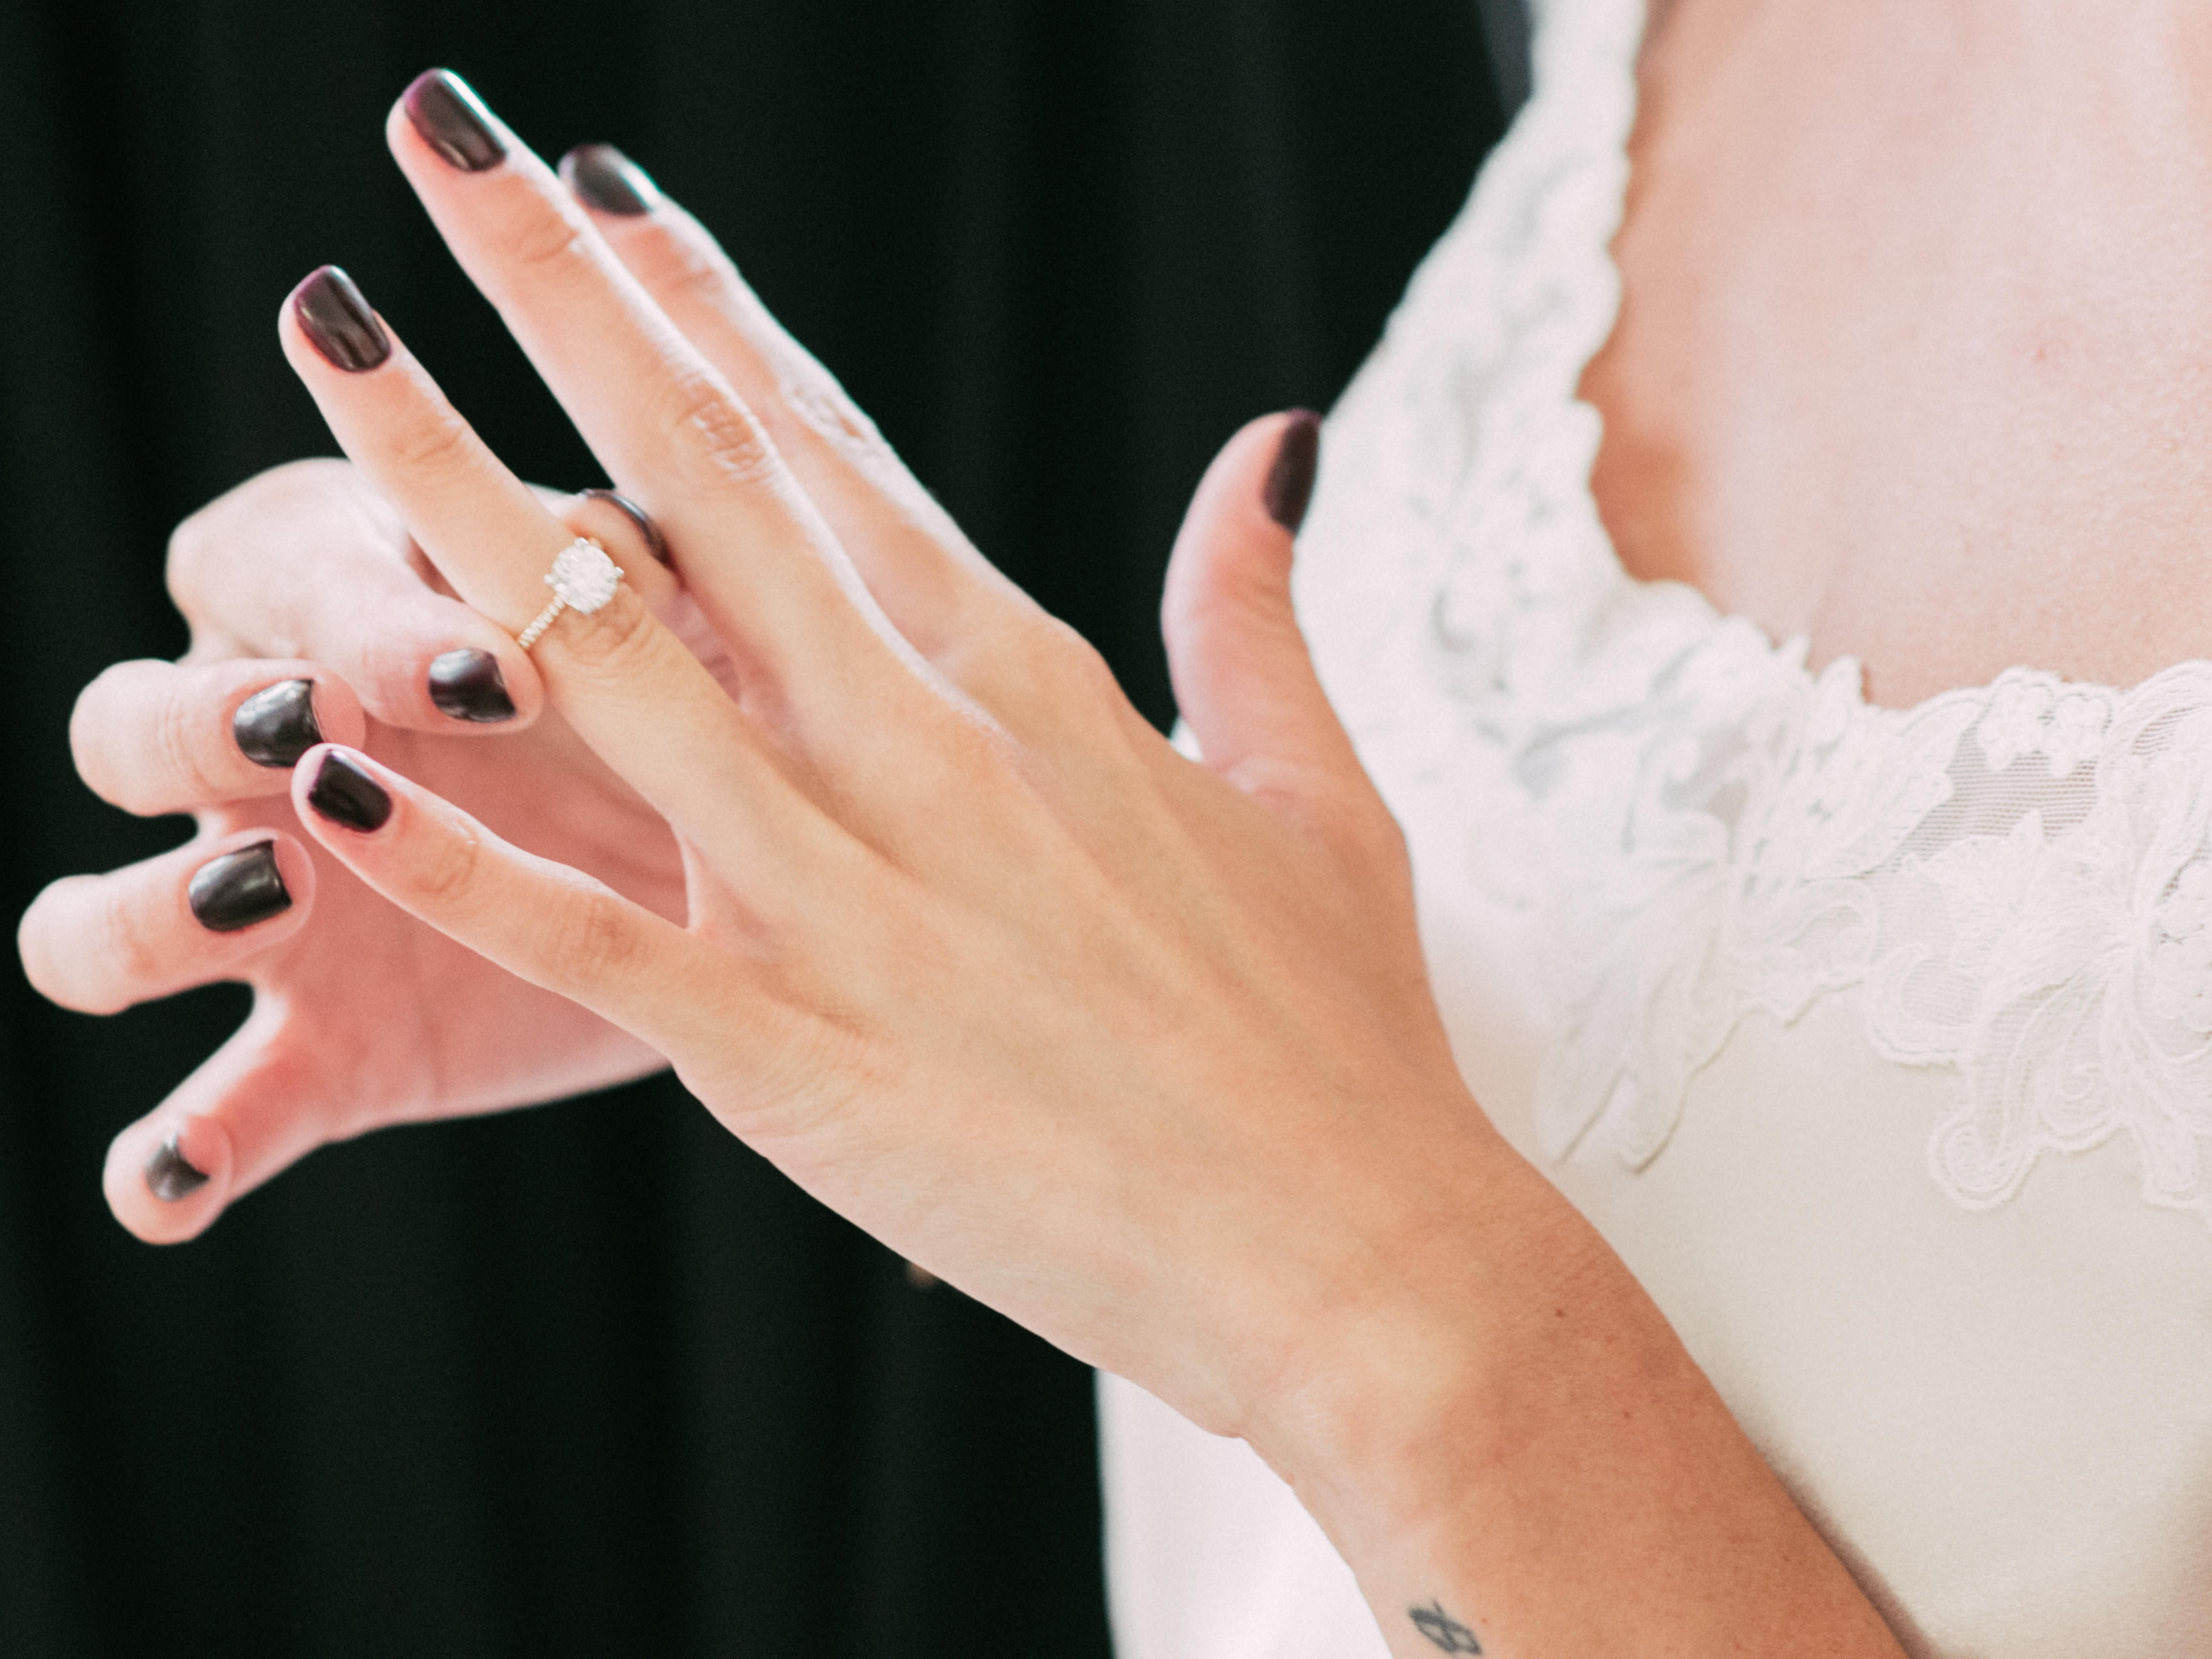 Wedding Ring Worn On The Left Hand